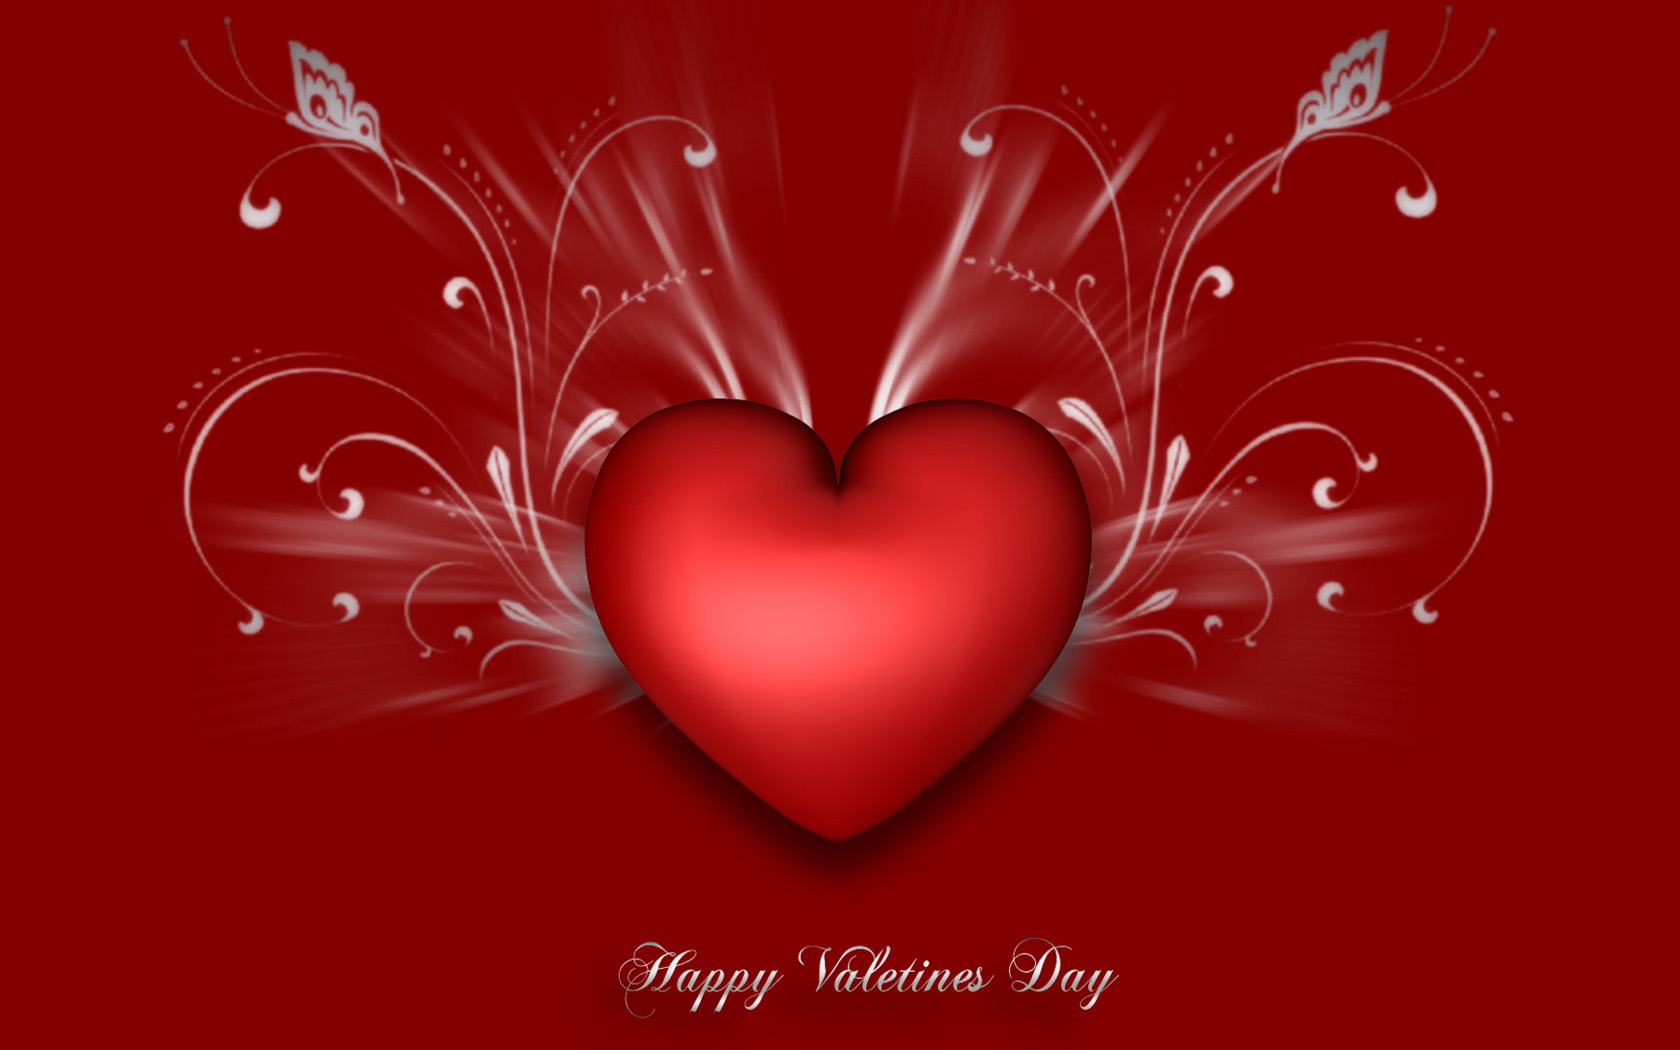 happy valentines day wallpaper 09 happy valentines day wallpaper 10 1680x1050